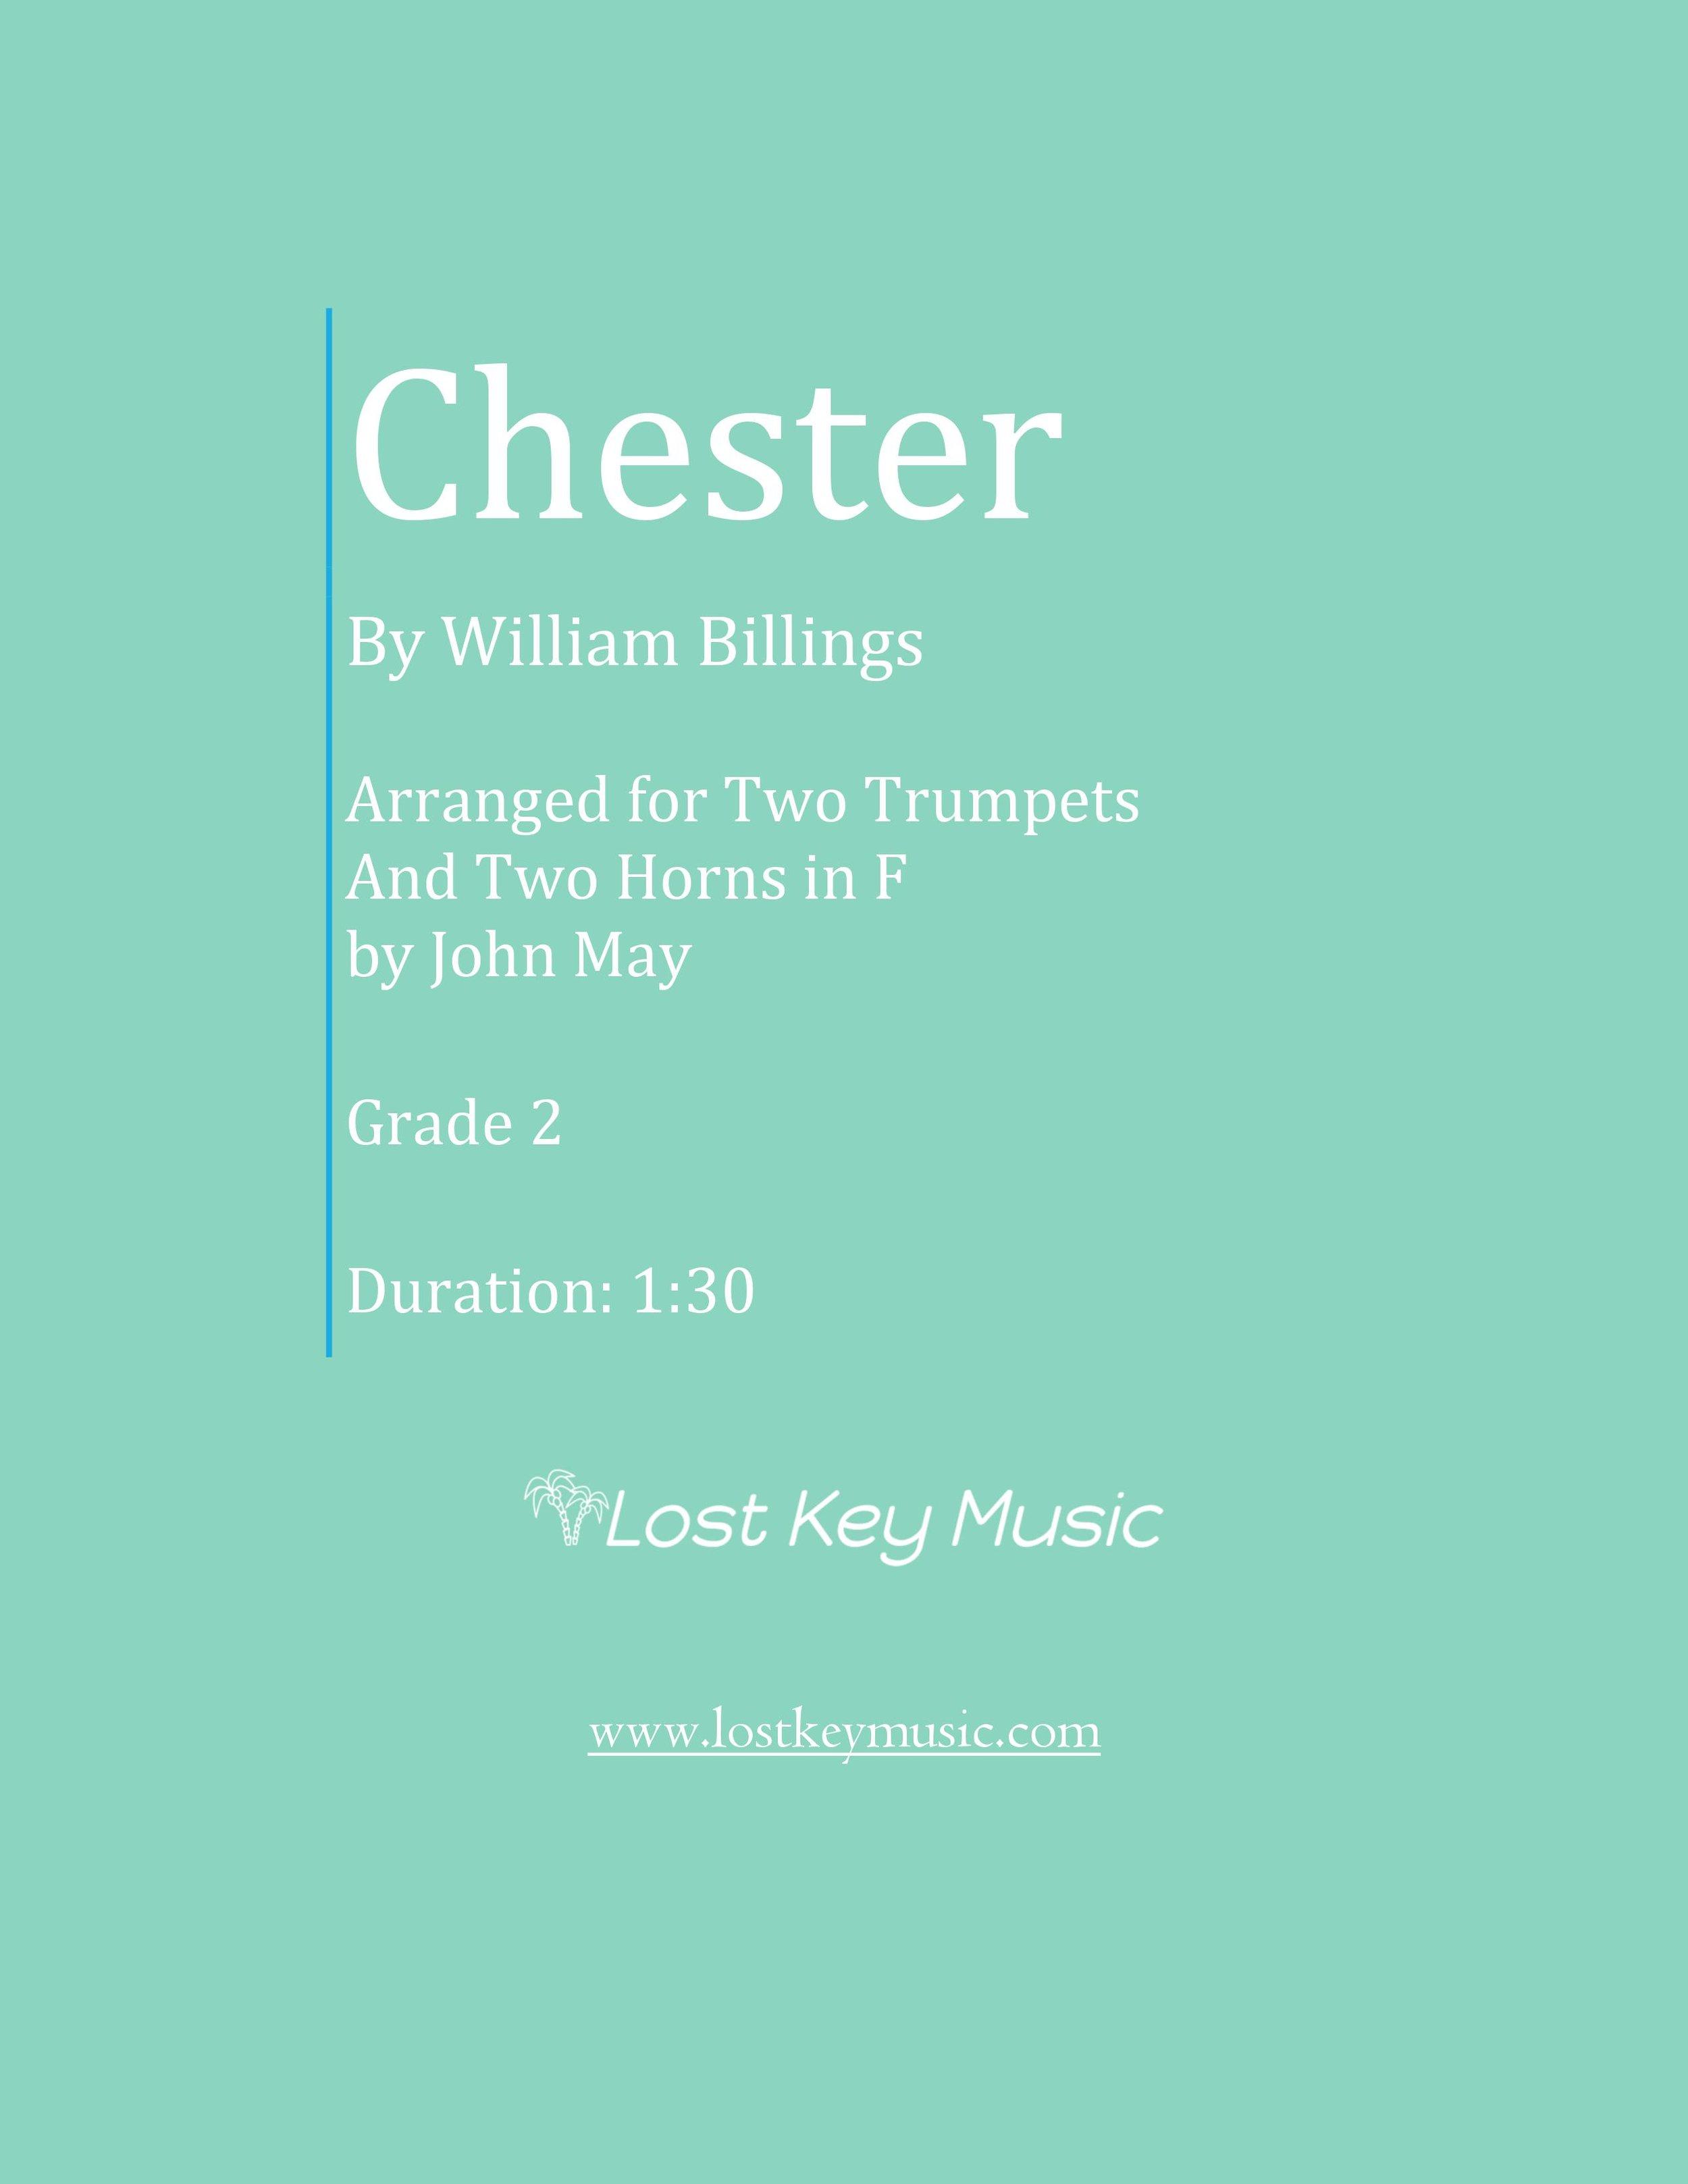 Chester-Cover Photo.jpg